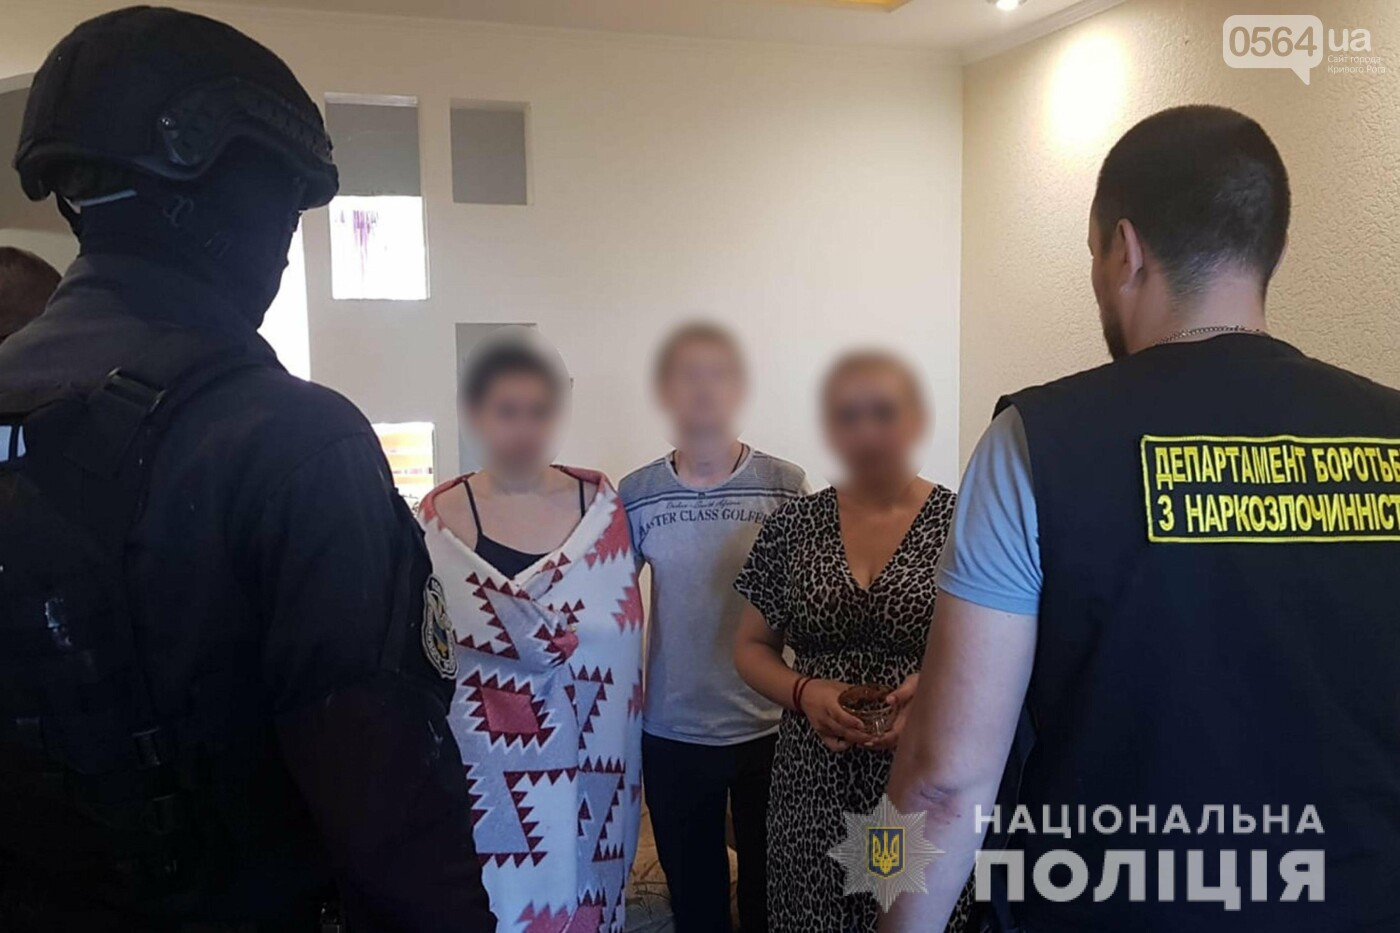 В Кривом Роге разоблачили наркоторговцев с товаром на сумму 140 000 гривен, - ФОТО, фото-3